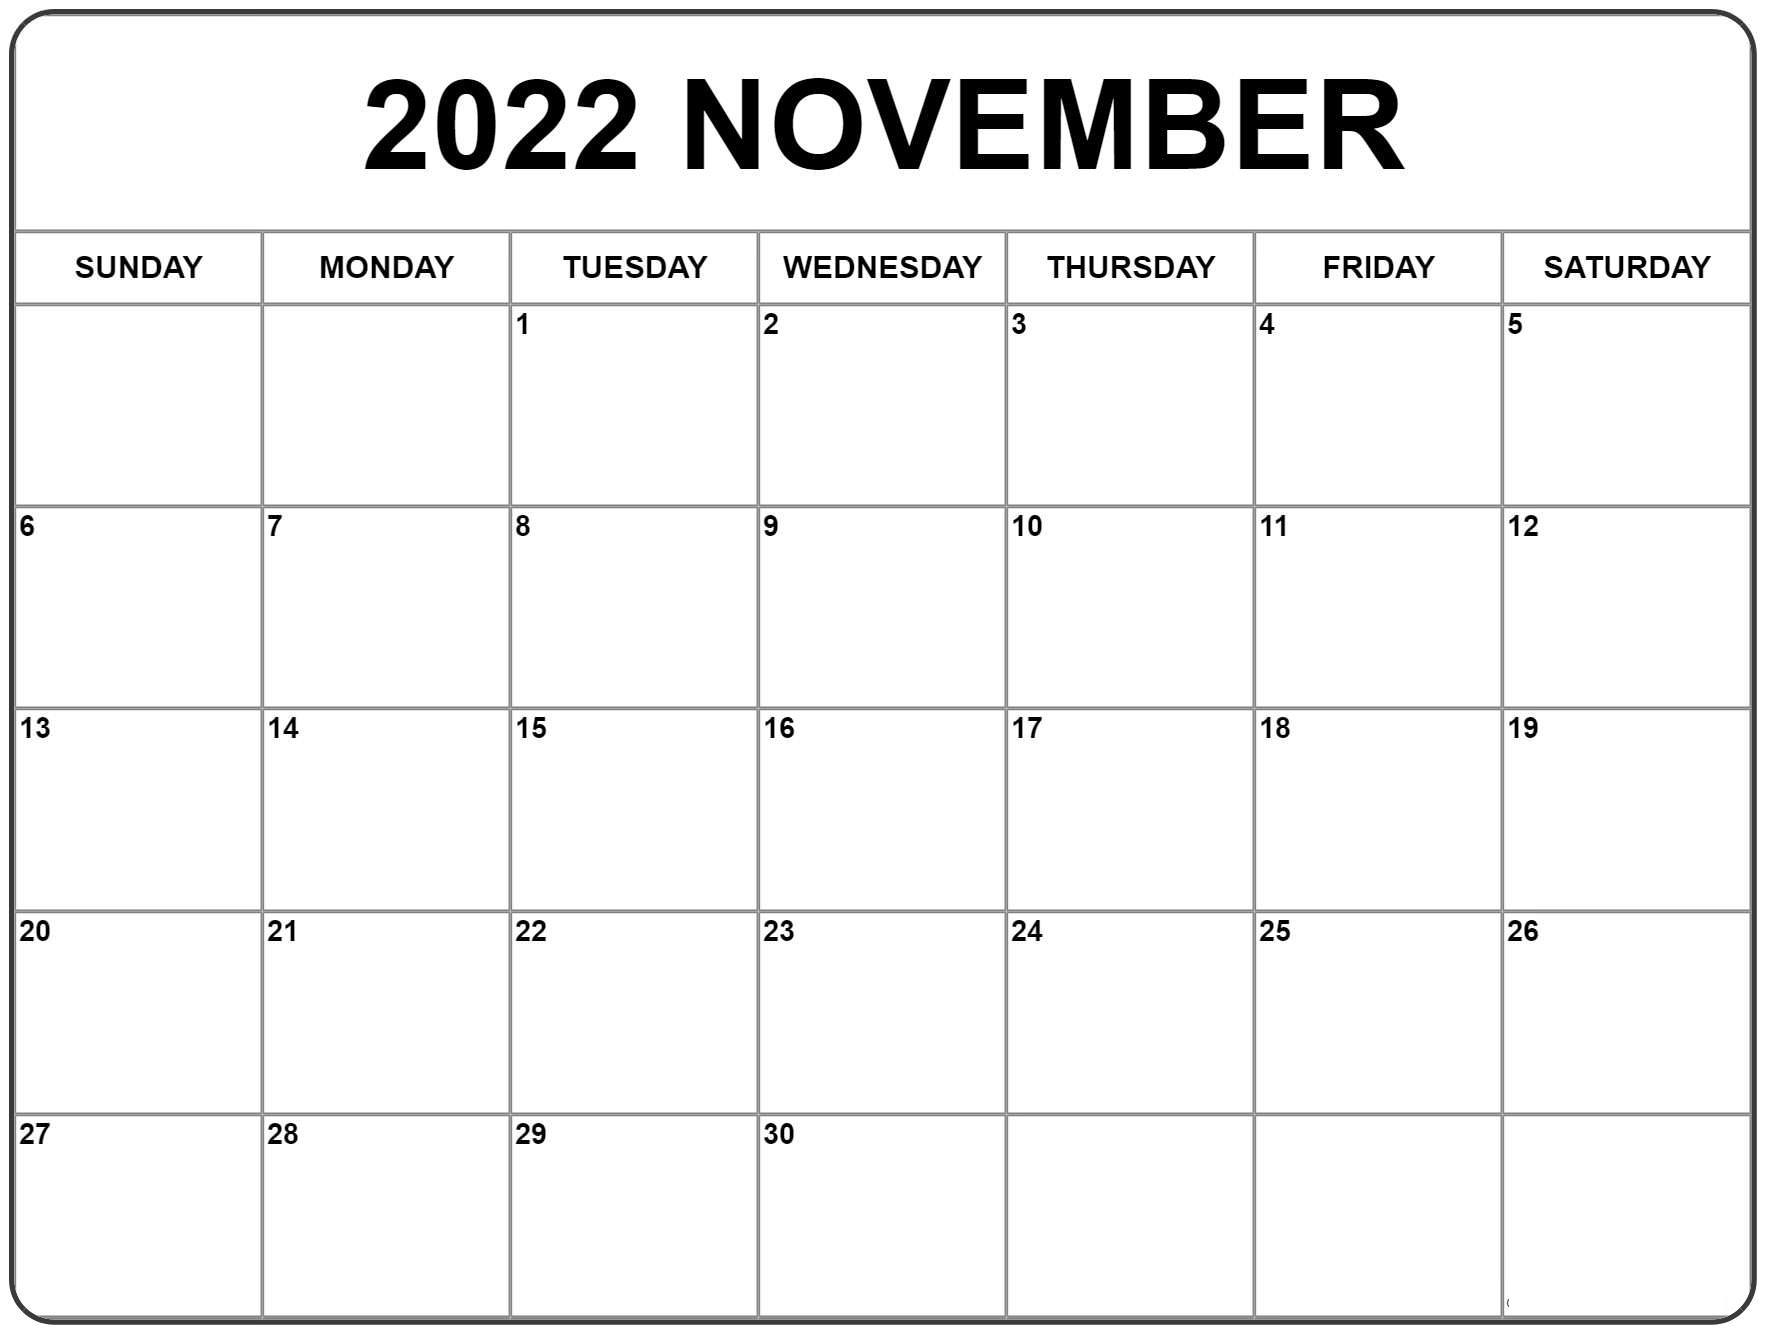 November Kalender 2022